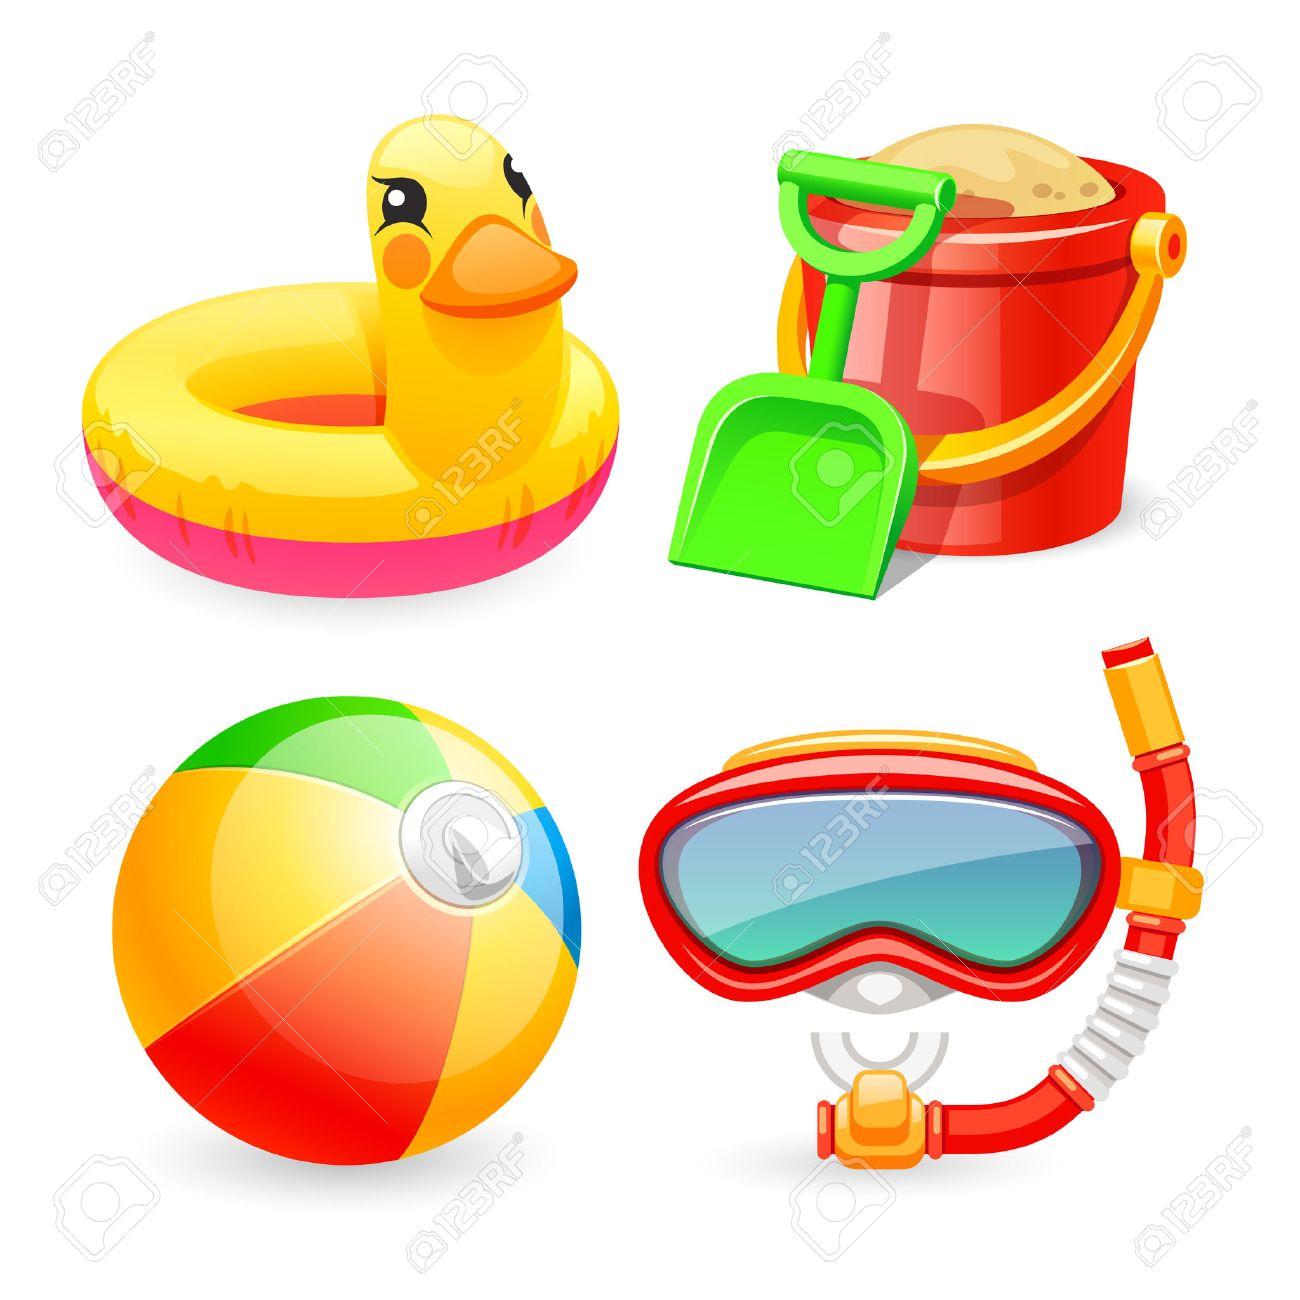 Beach toys clipart 6 » Clipart Station.